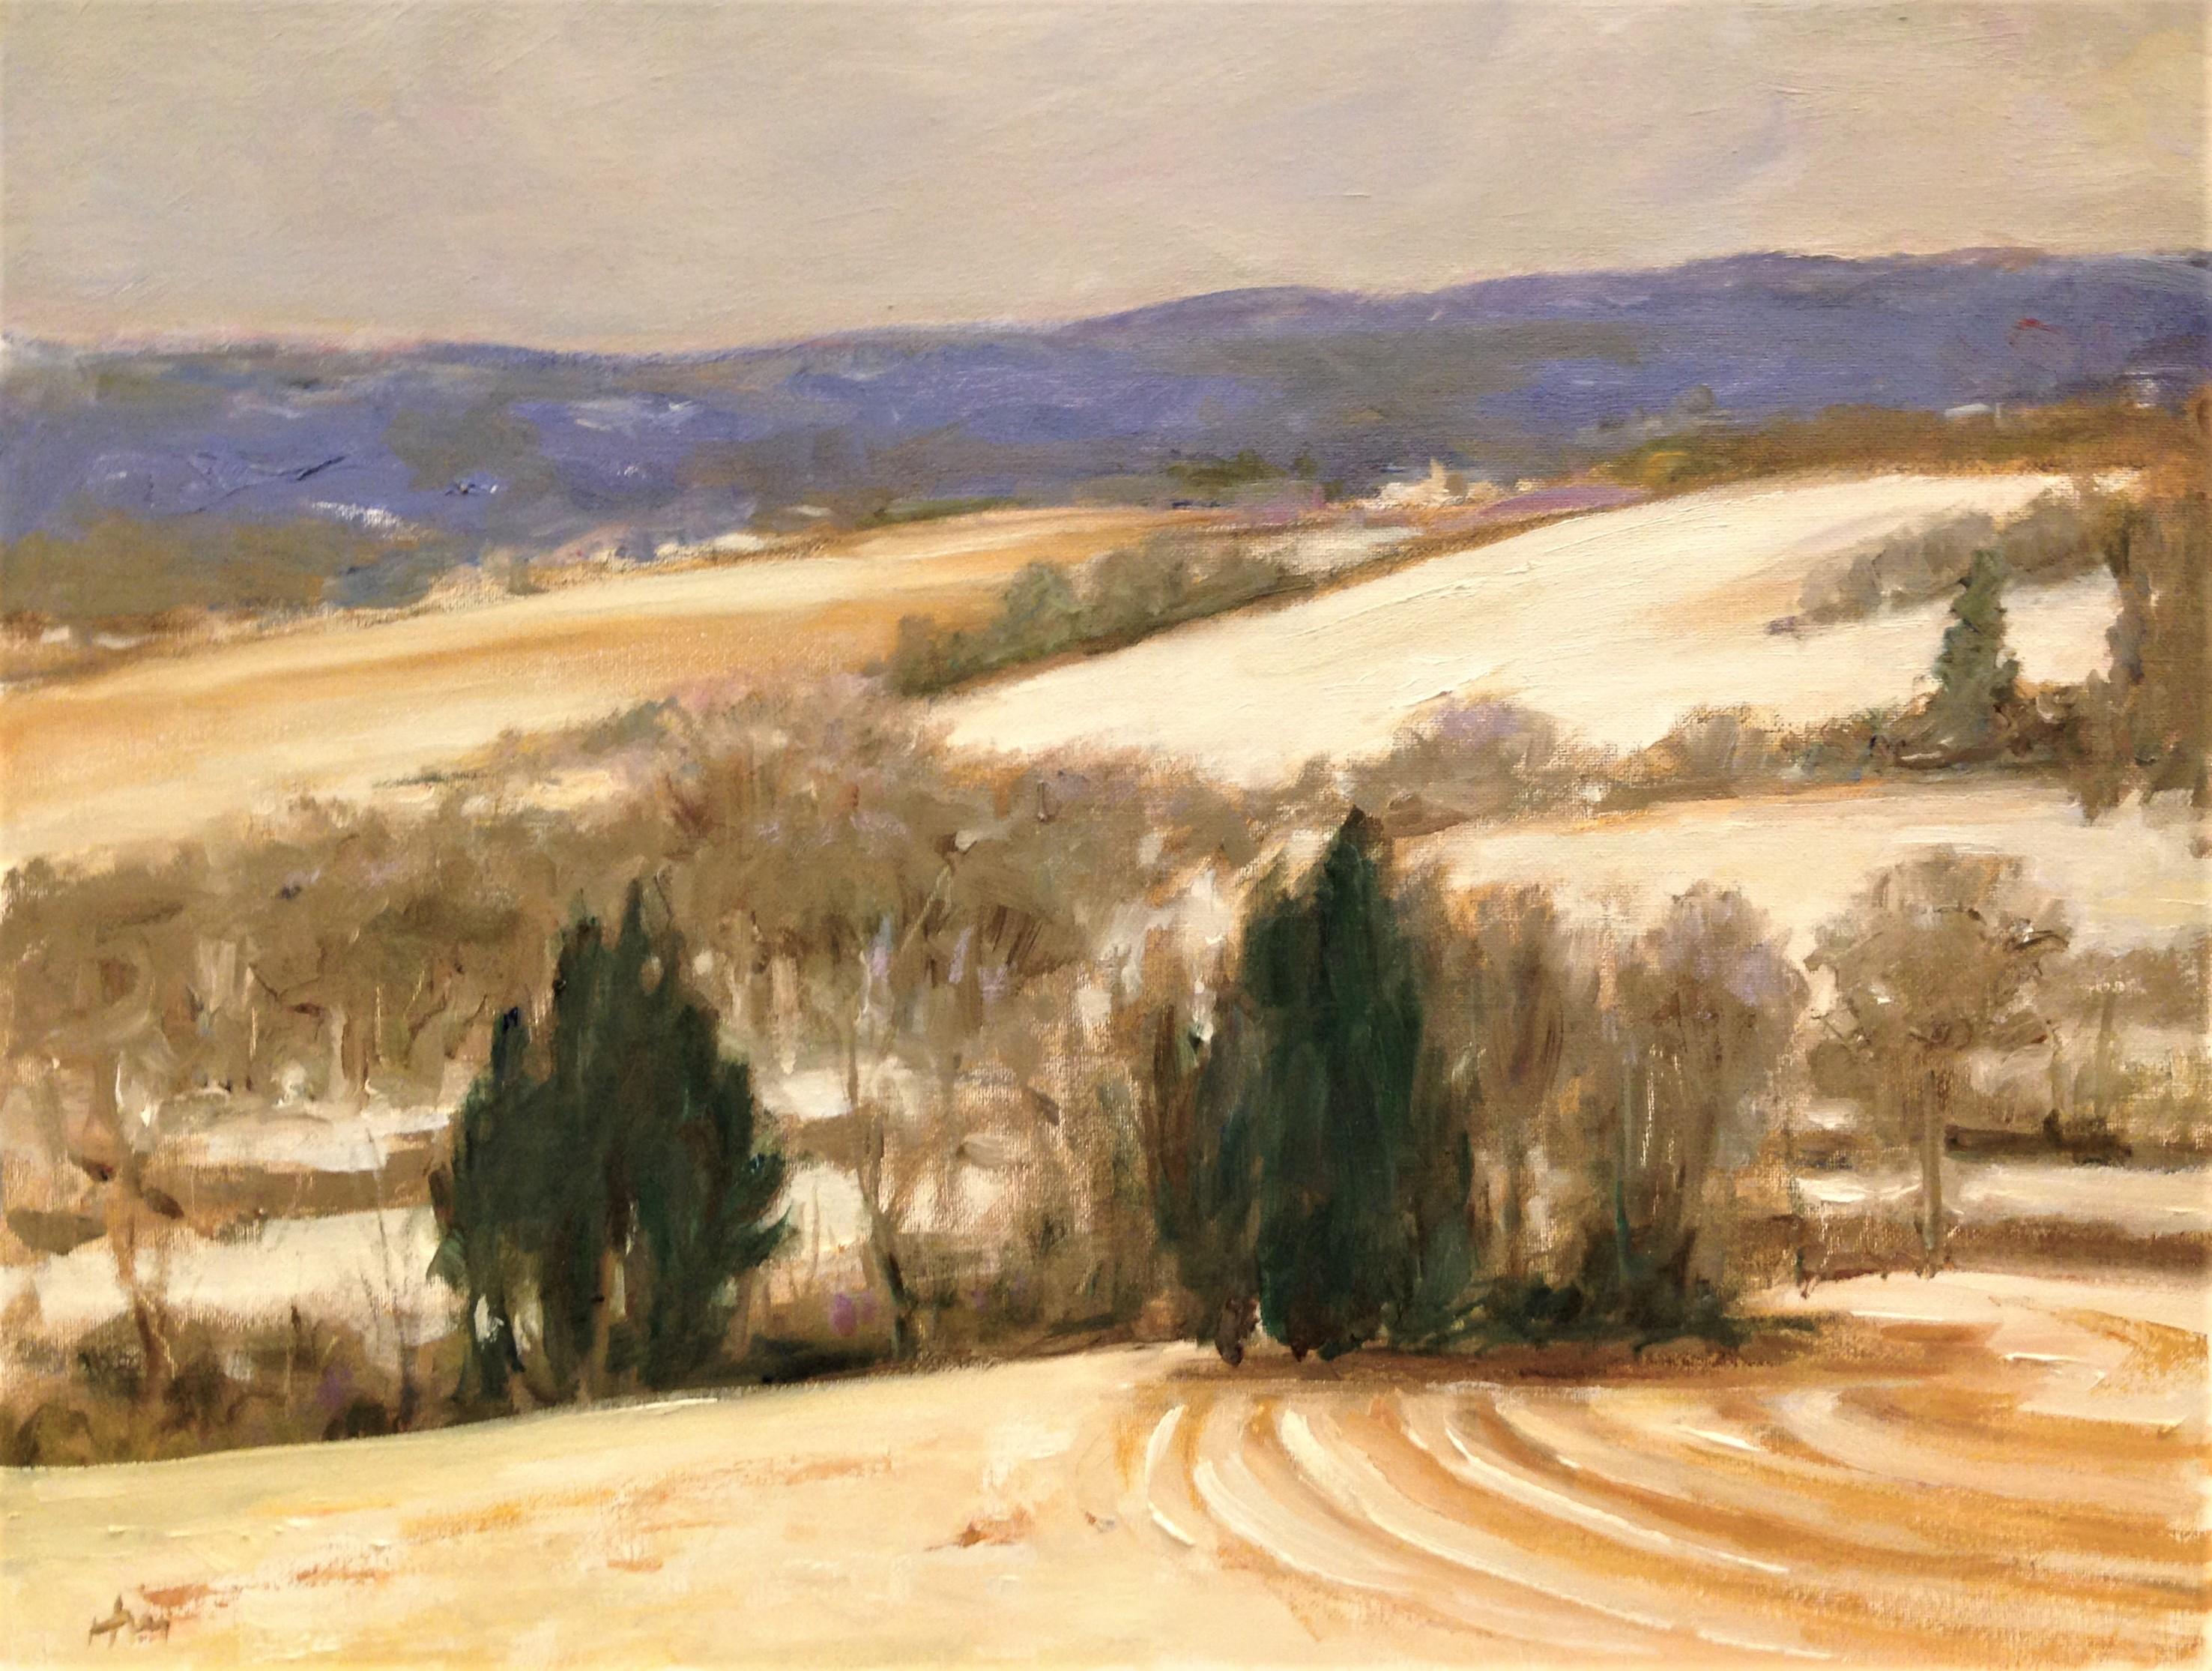 Across the Valley- Straub's Preserve